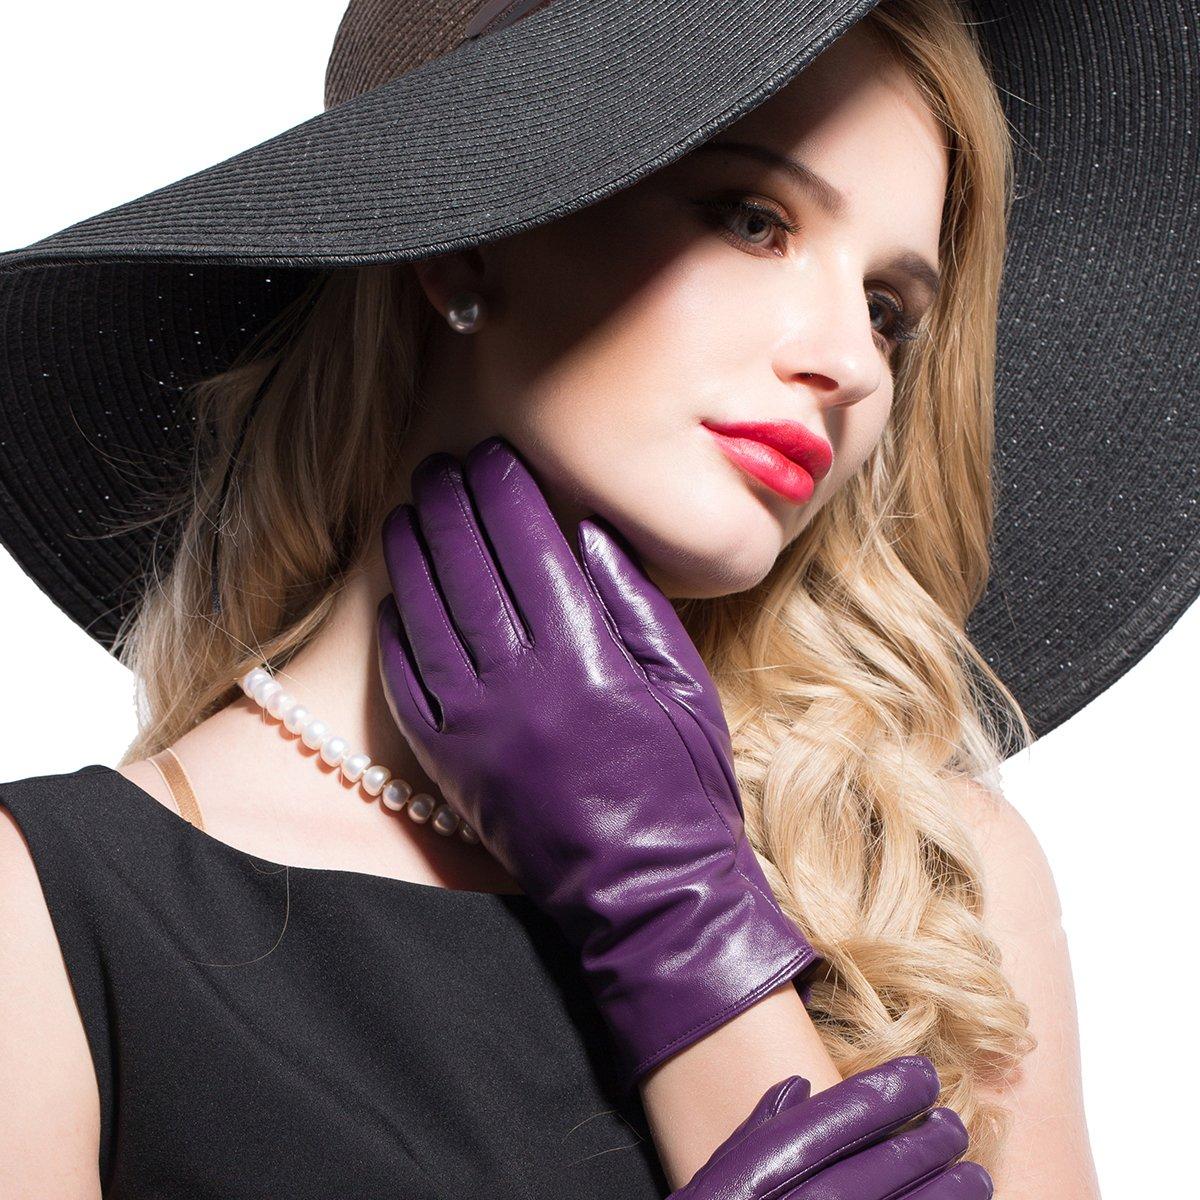 Kursheuel 14 colors Cashmere Women Lady's Genuine lambskin soft leather driving Gloves KU141 (L, Purple) by Kursheuel (Image #4)